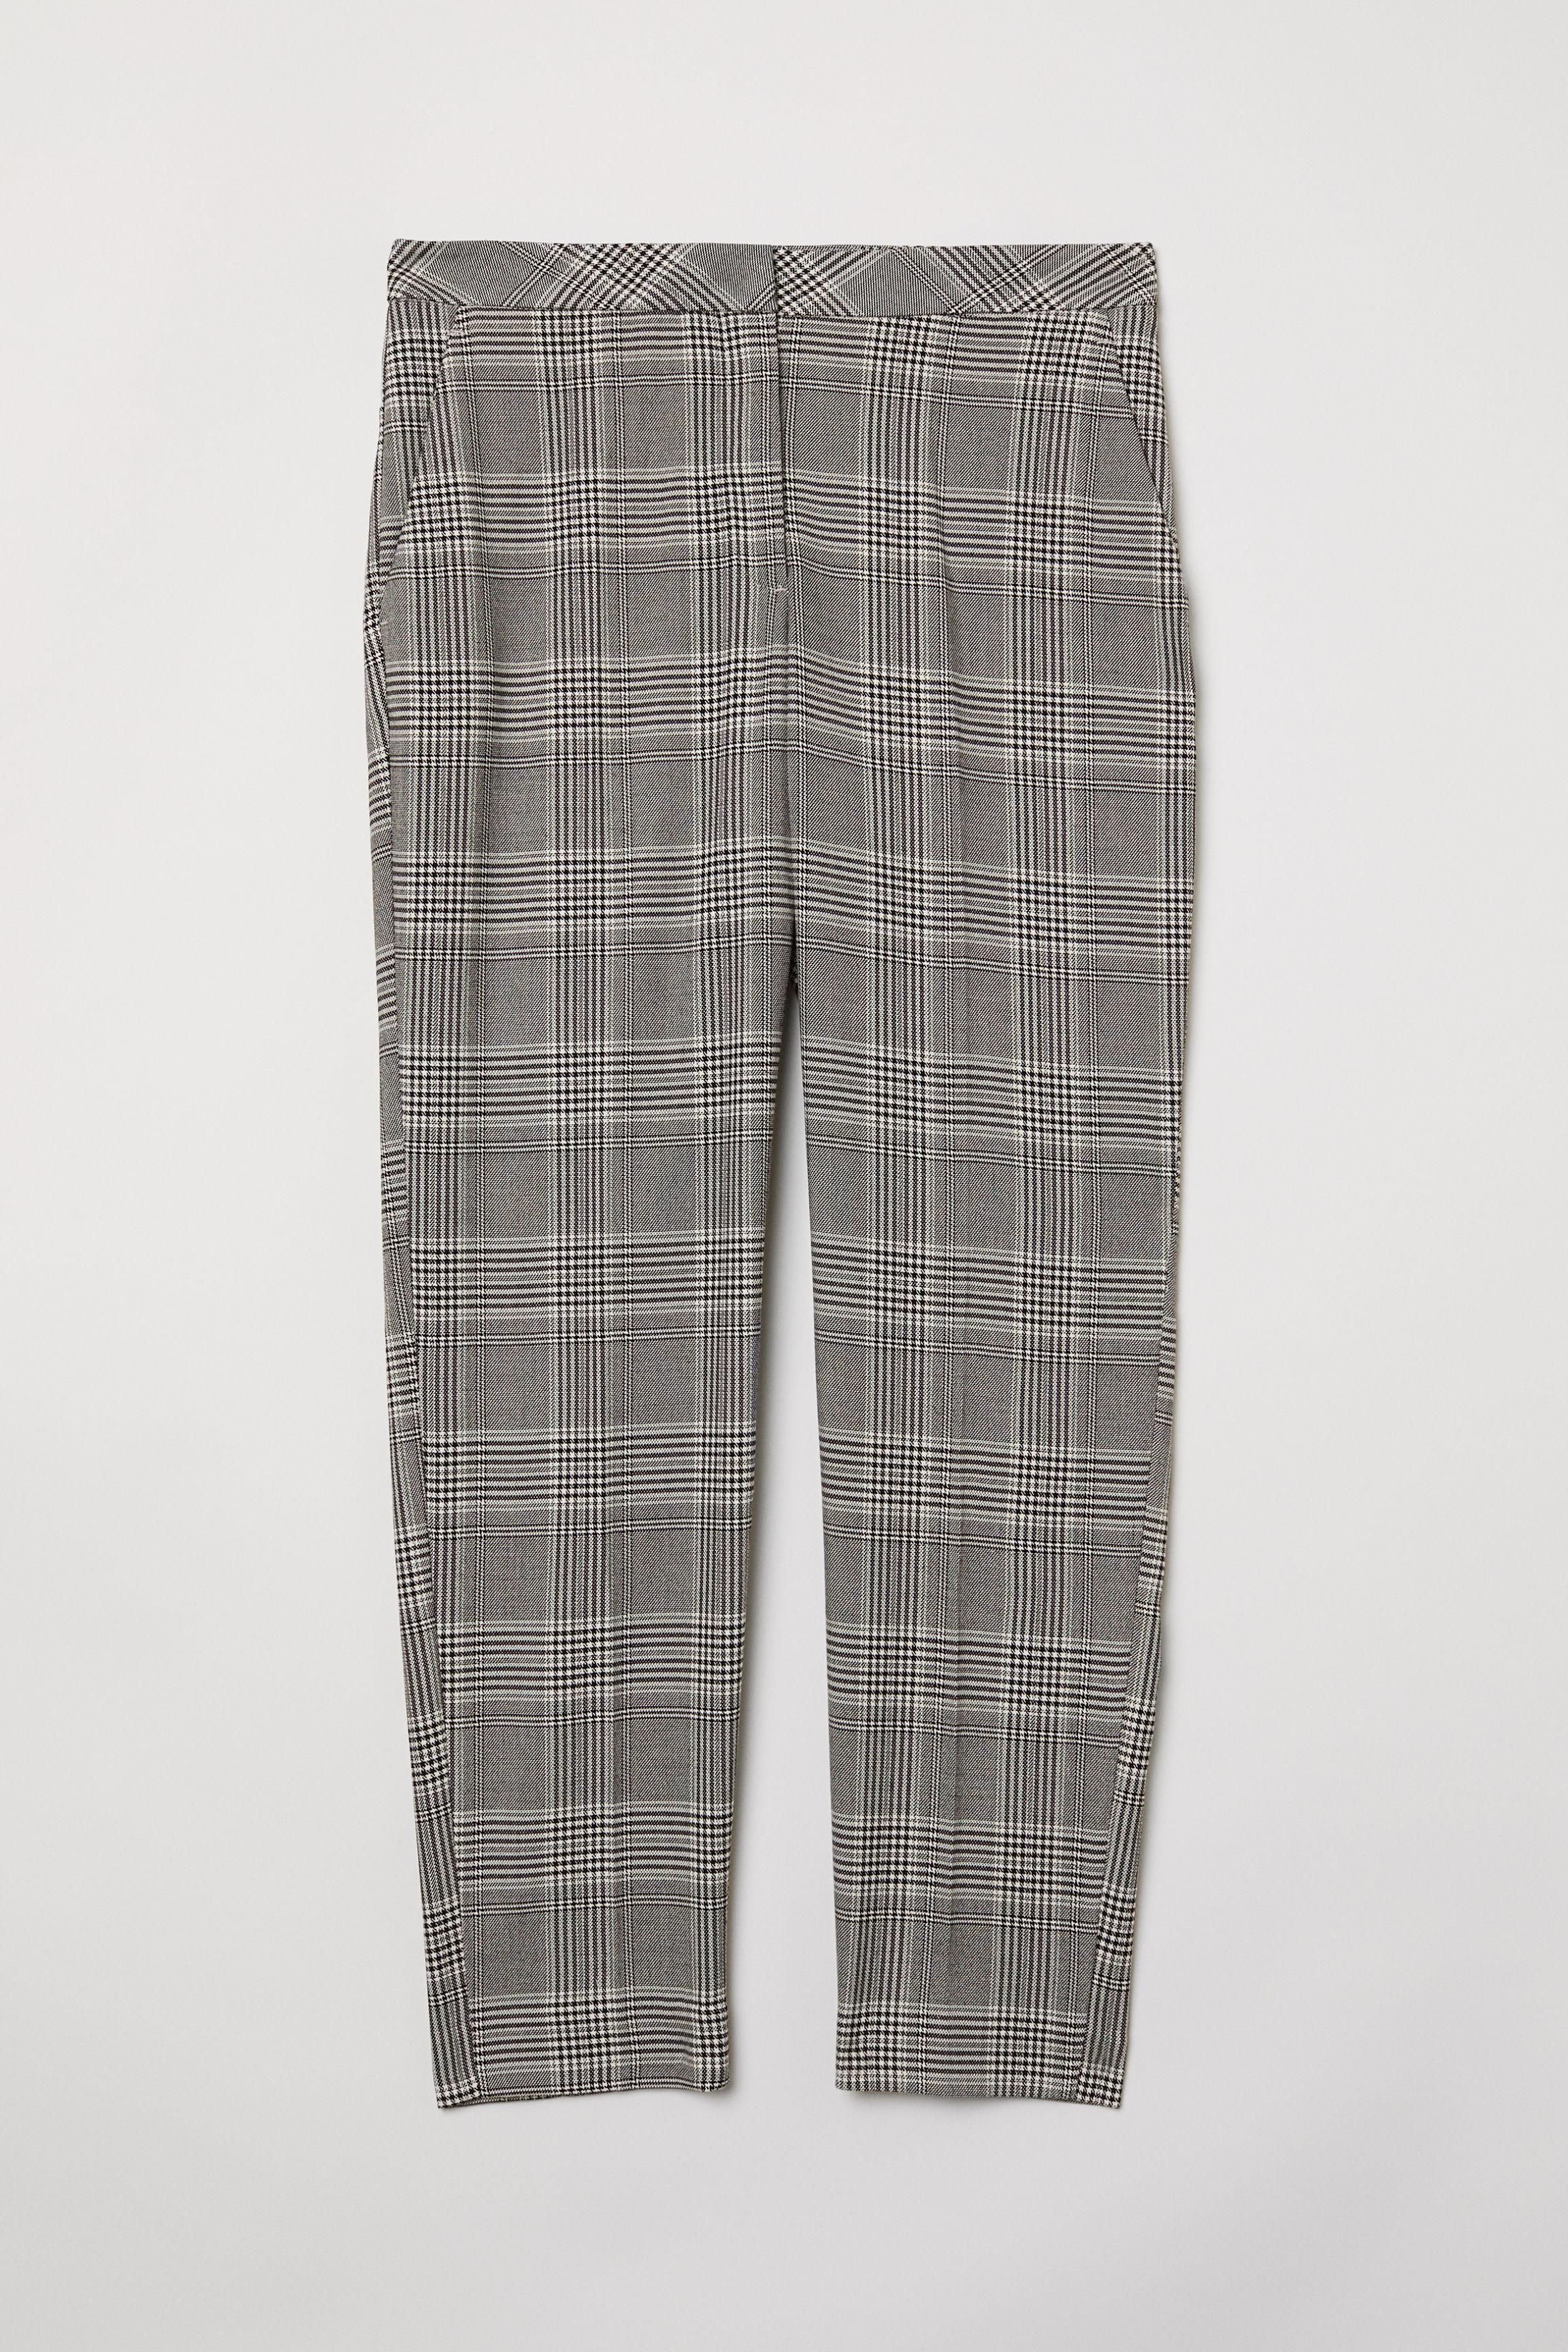 new release aliexpress new arrivals Dress Pants